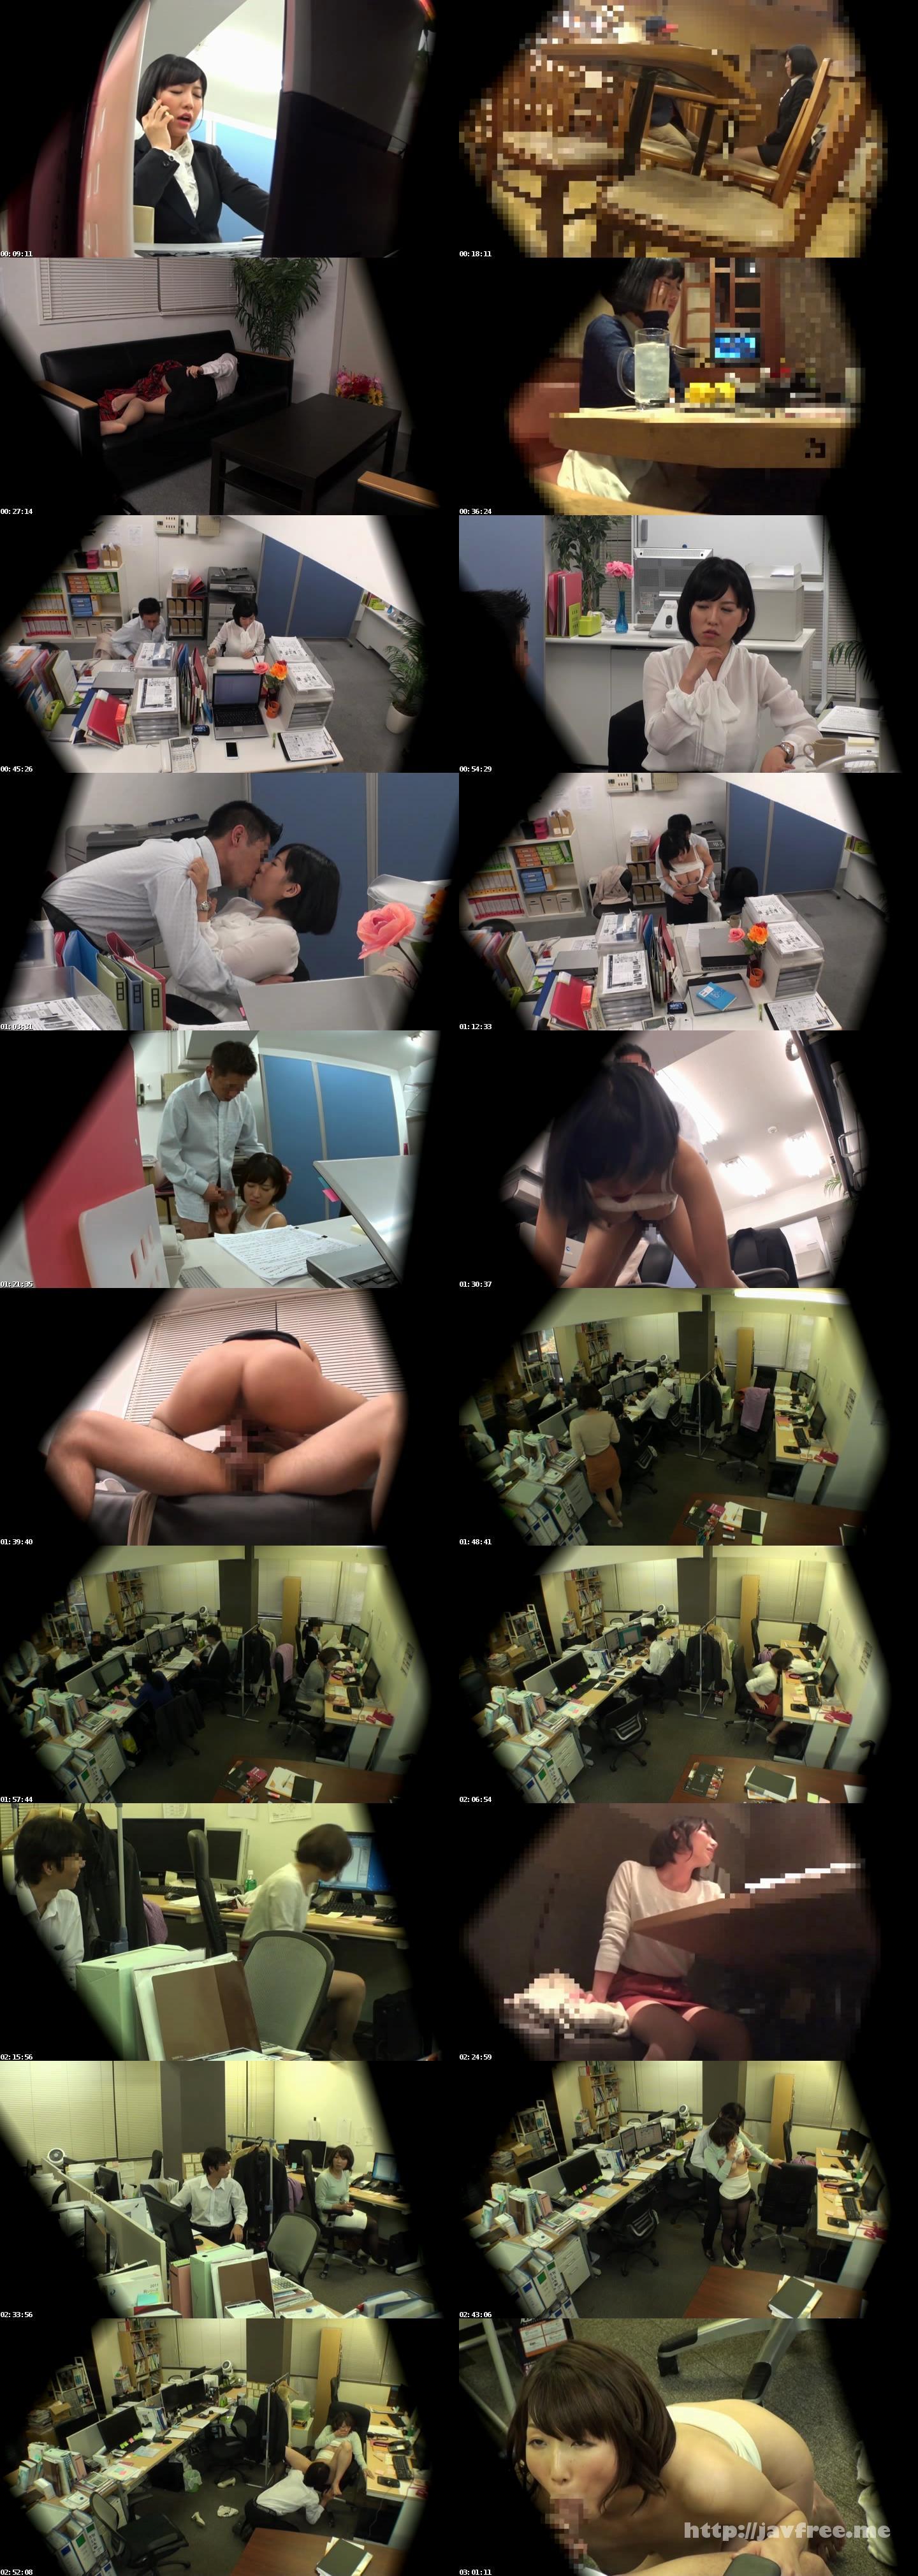 [DVDES-815] 巨乳の上司と職場でセックスしたい…2人きりのオフィスで残業中に部下のイケナイ欲望を告白された年上の女子社員は身体を許してしまうのか!?バレたら即懲戒免職の社内盗撮でそのヤリたい願望をAV制作会社が完全バックアップ!! - image DVDES-815 on https://javfree.me